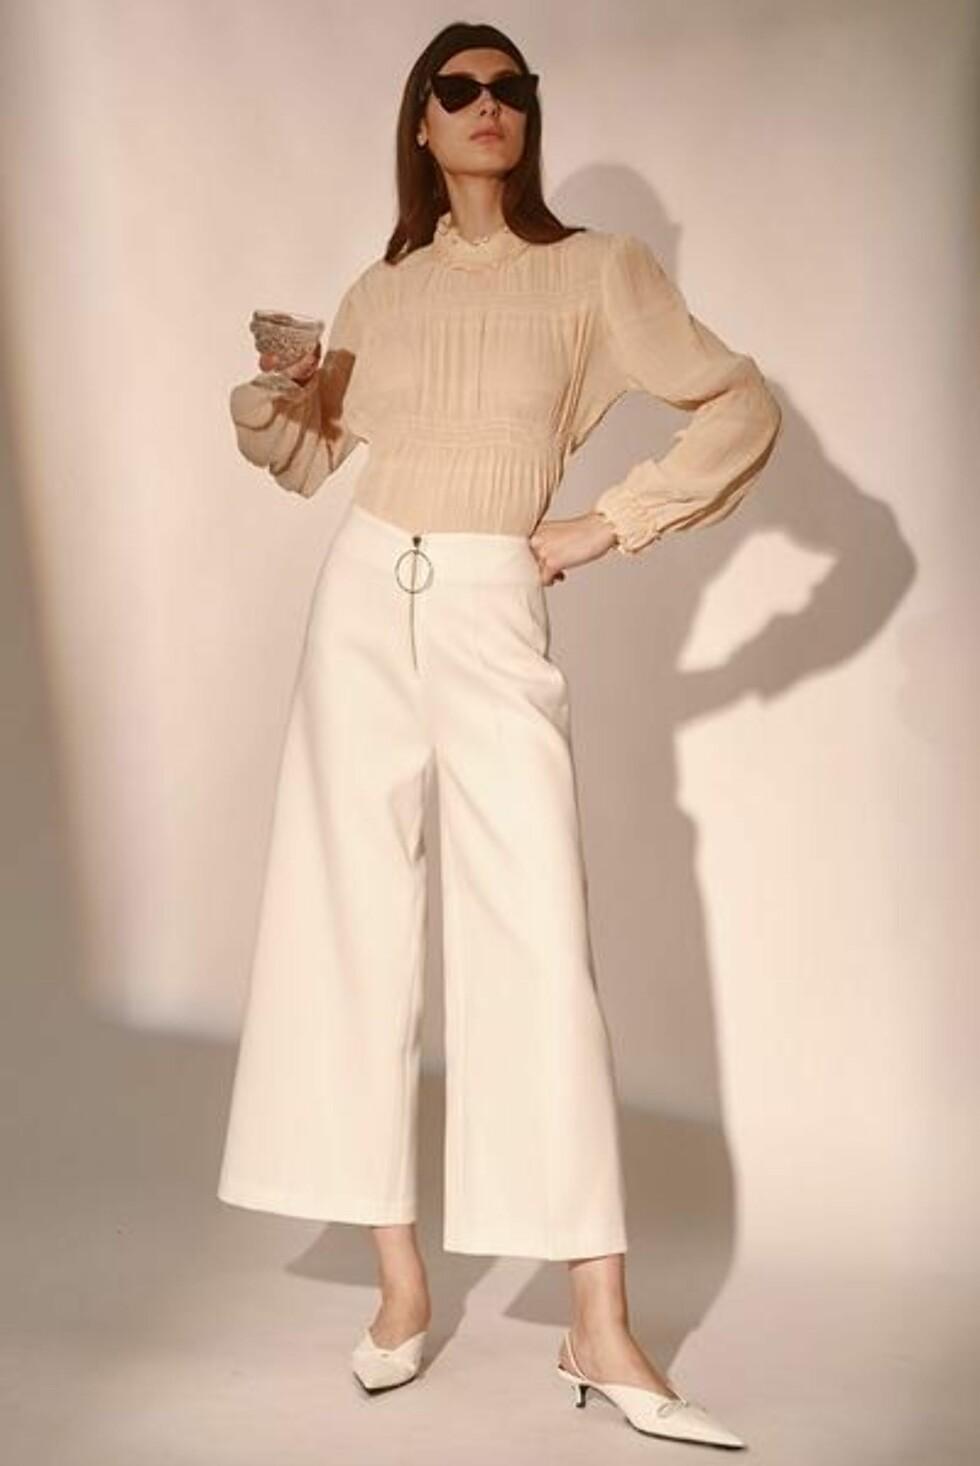 Bukse fra Style Mafia |775,-| https://stylemafia.us/collections/new-arrivals/products/ernav-pants-white#.WzNoDFUzbRZ